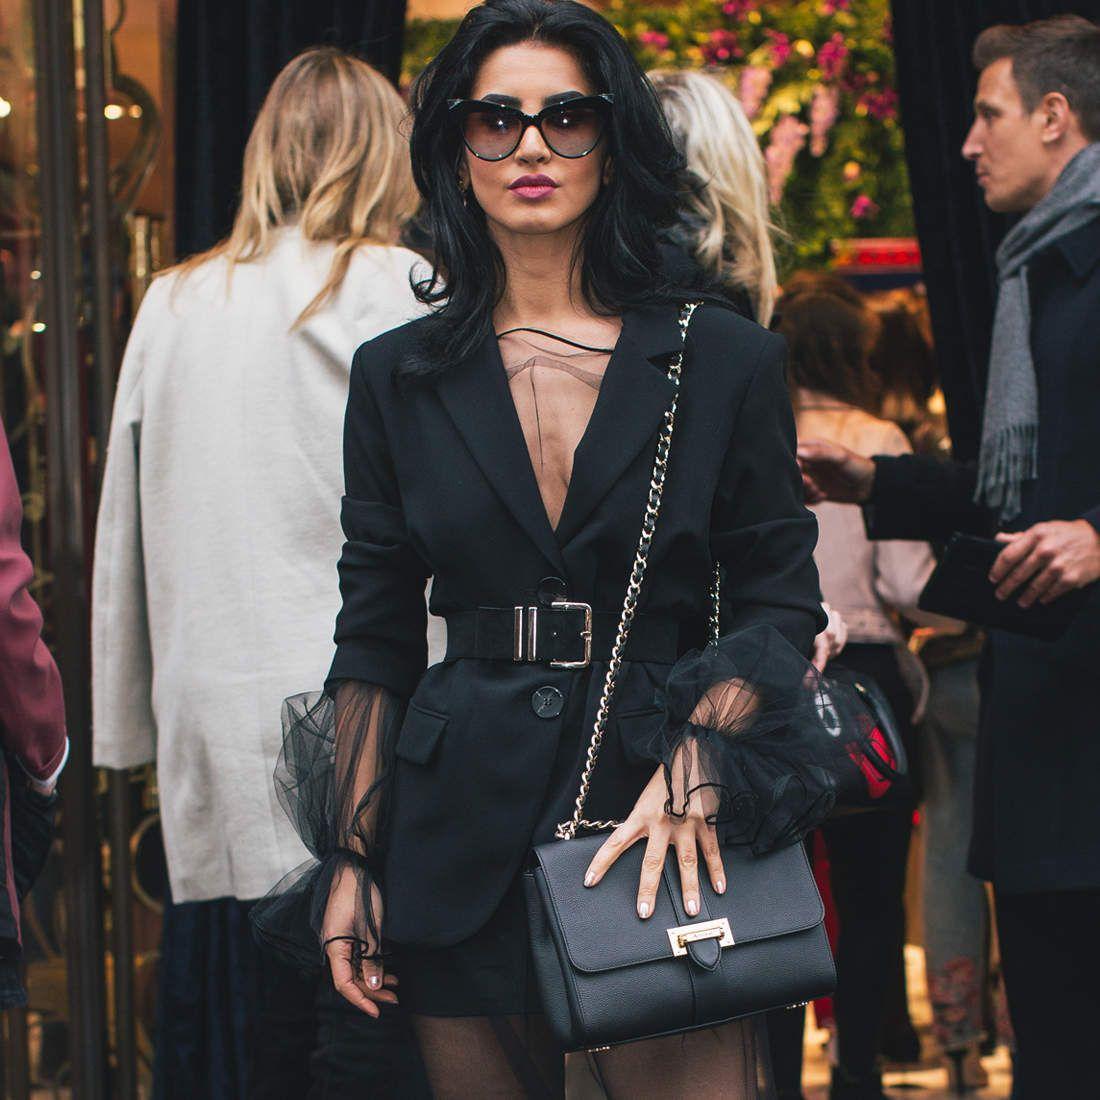 Large Lottie Bag in Black Pebble | Fashion, Fashion outfits